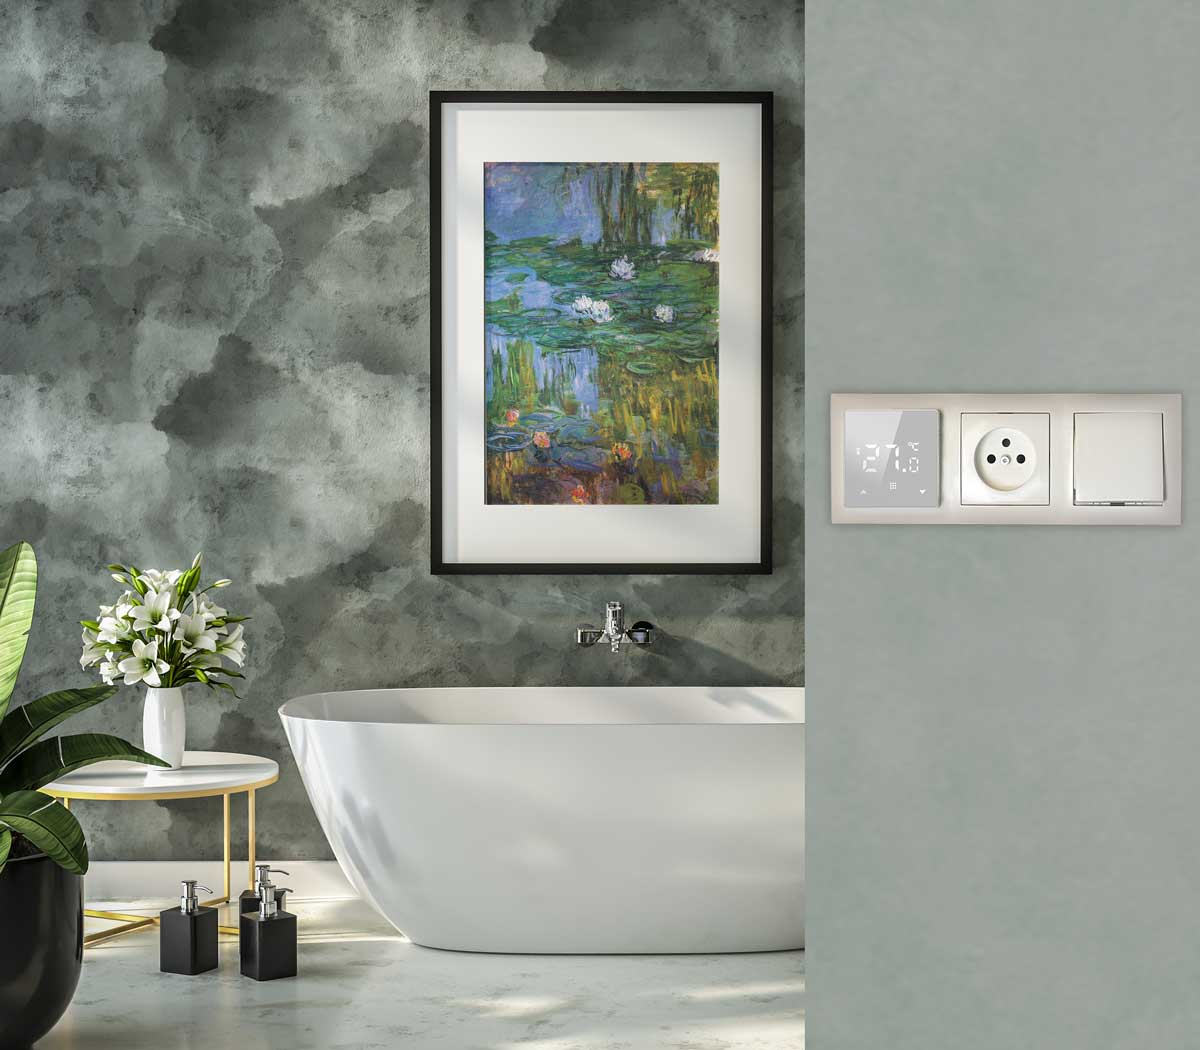 H6---łazienka2